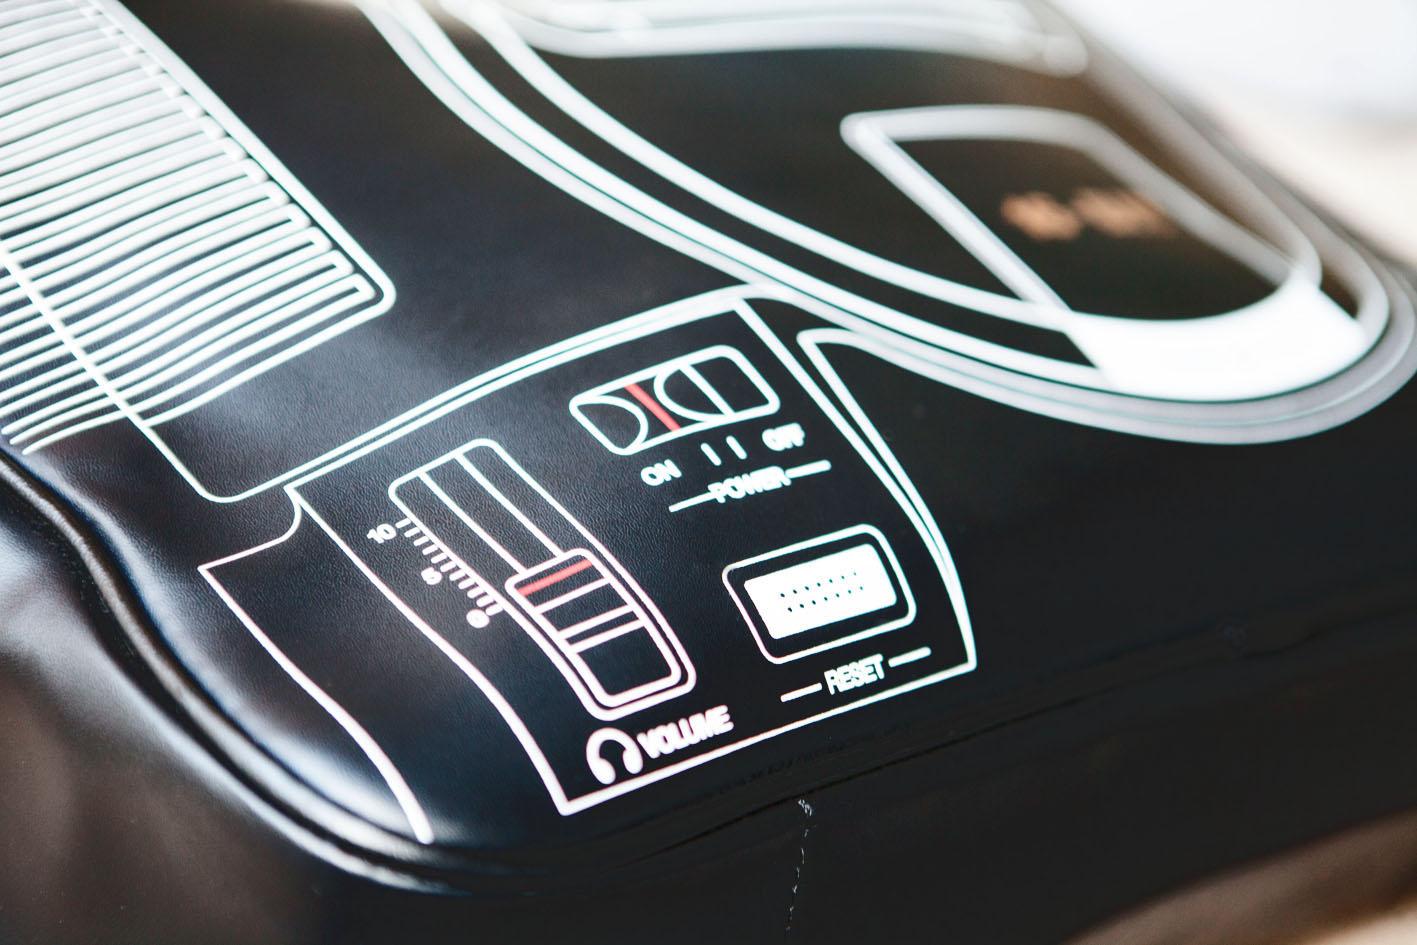 Die Mega Drive-Tasche. (Foto: insertcoinclothing.com)